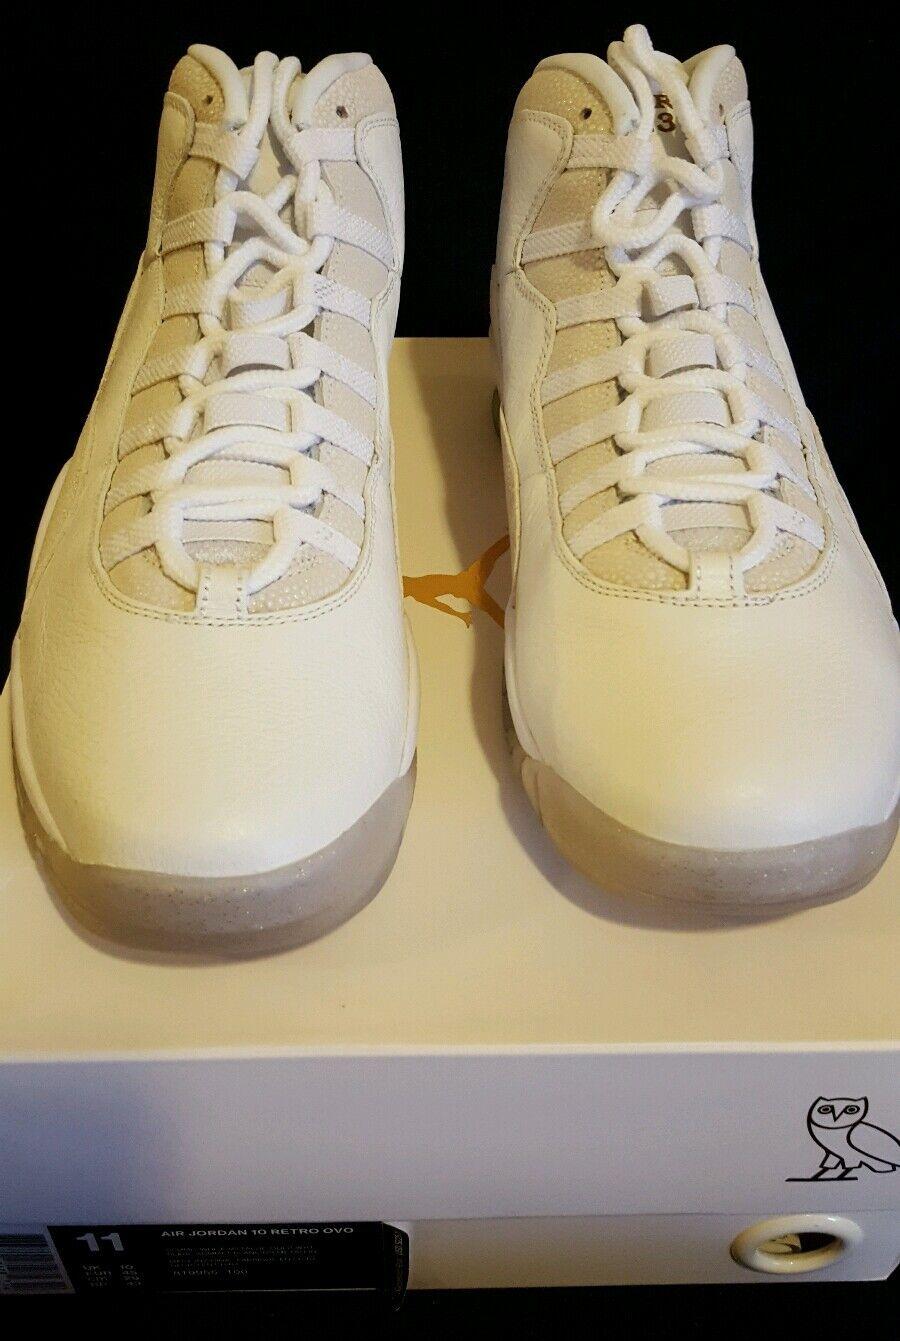 Air jordan 10 ovo white size 11